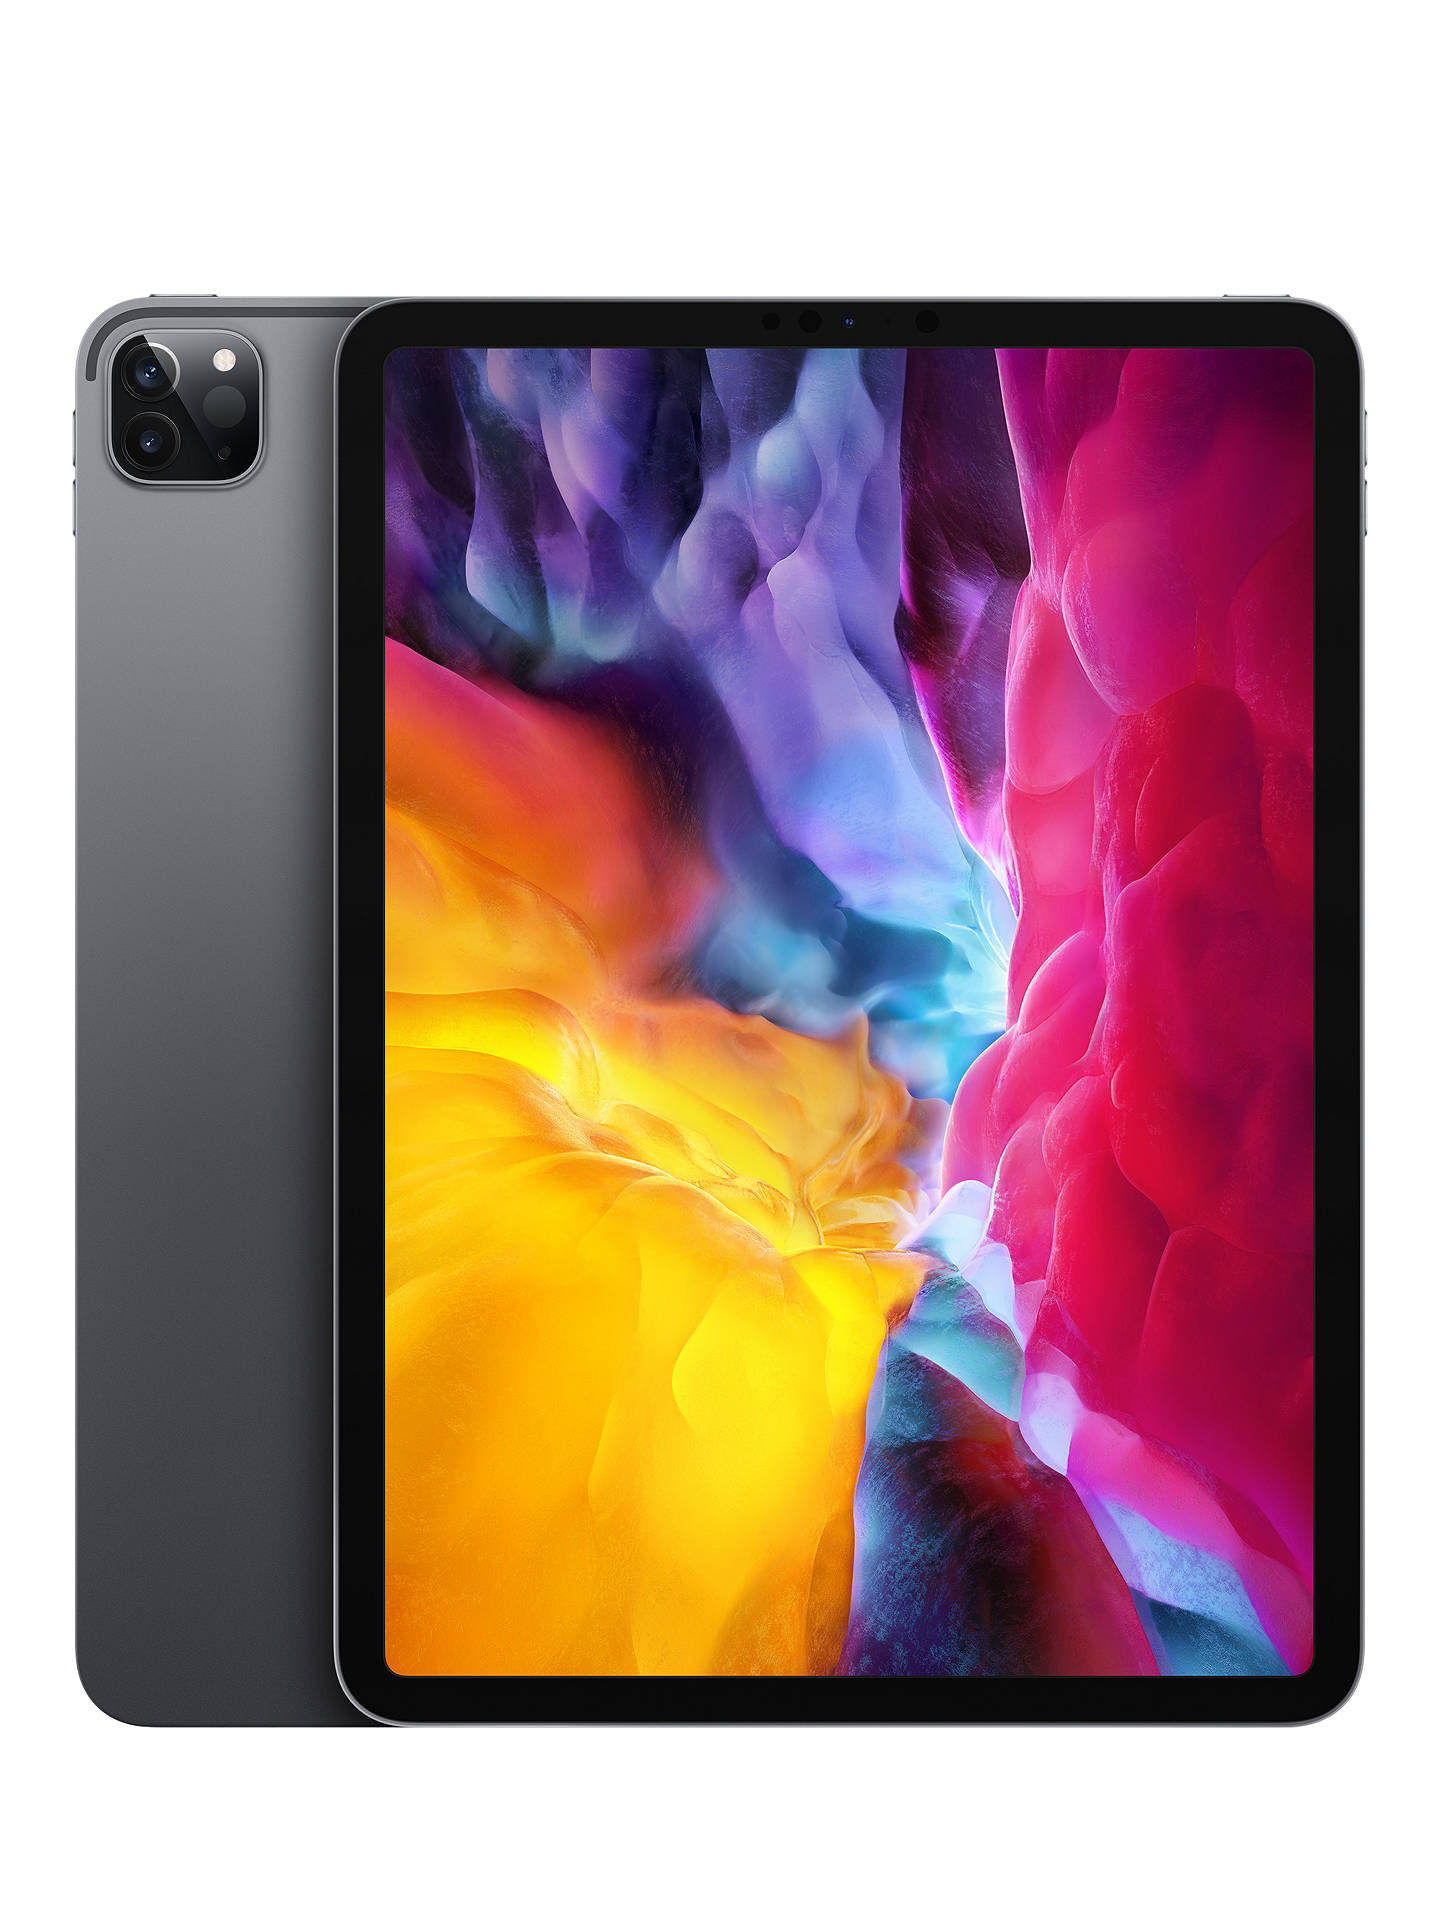 "2020 Apple iPad Pro 11"", A12Z Bionic, iOS, Wi-Fi, 256GB, Space Grey"